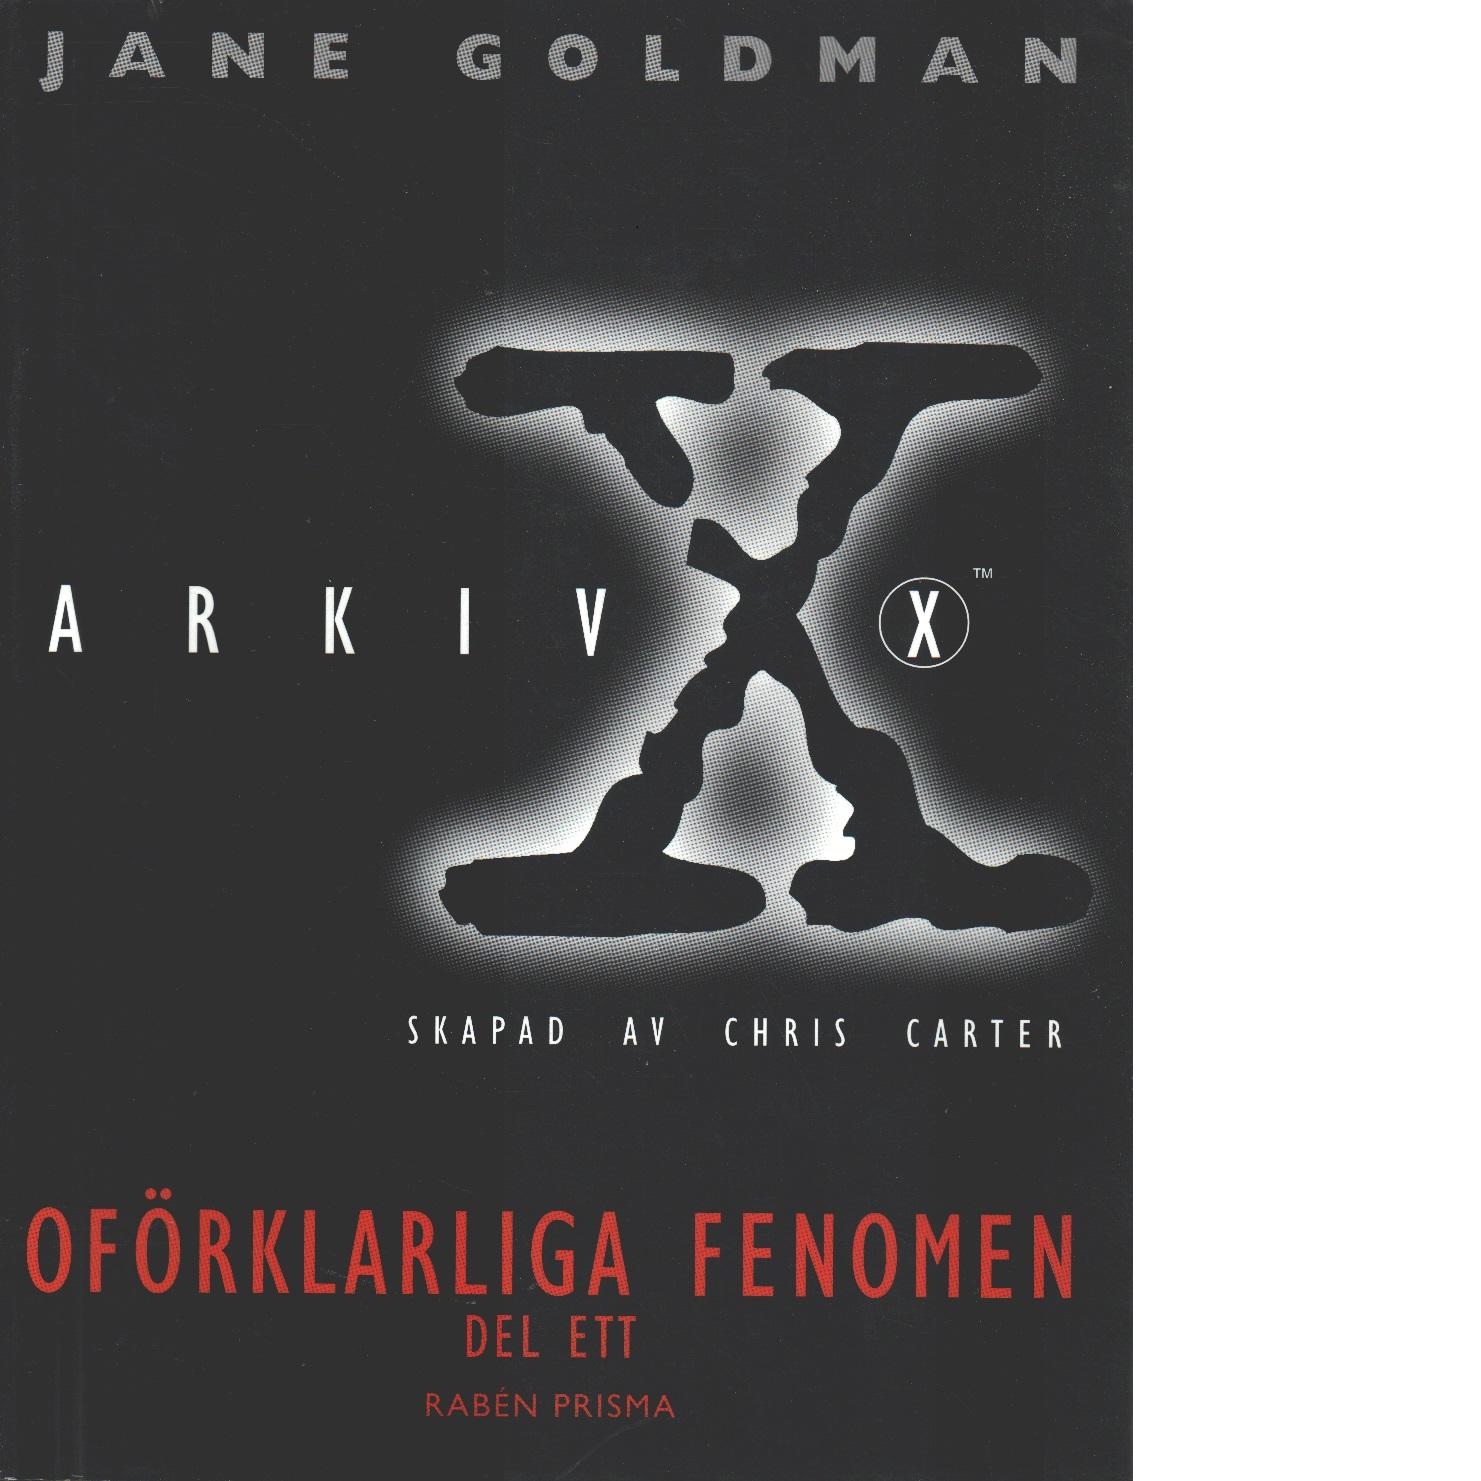 Arkiv X oförklarliga fenomen D. 1 - Goldman, Jane